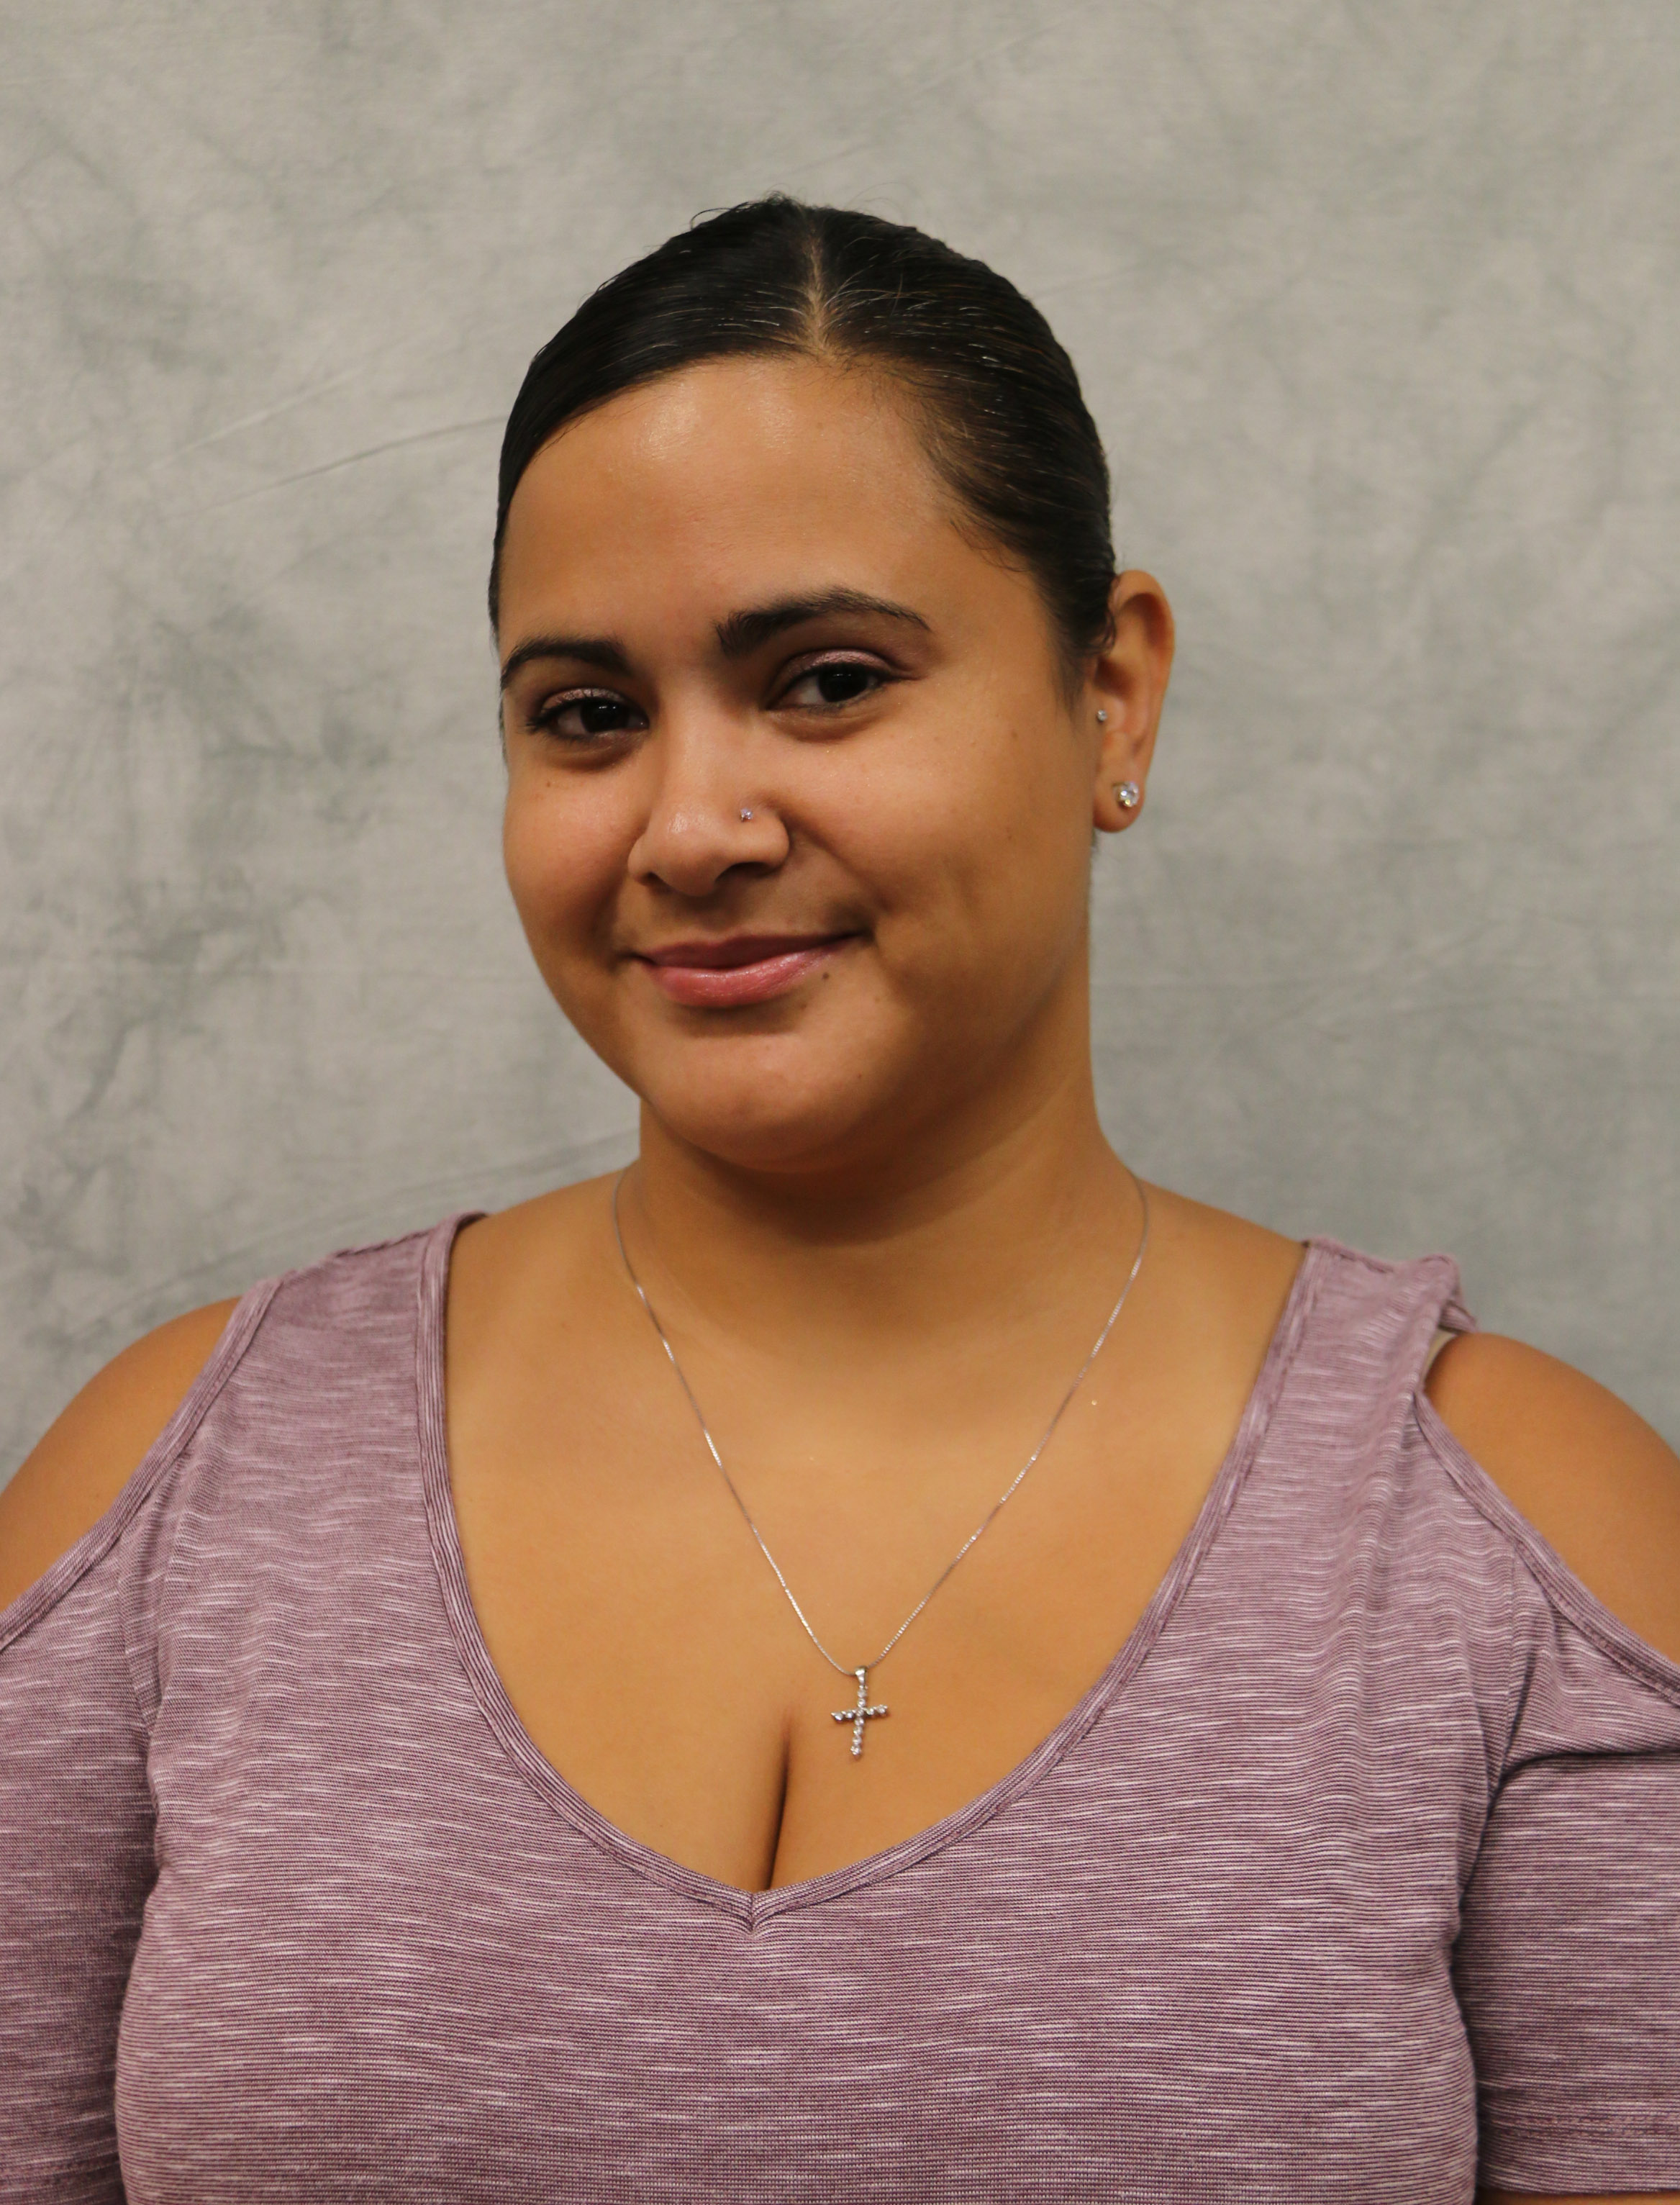 Middle School Welcomes Ms. Babilonia As New Art Teacher